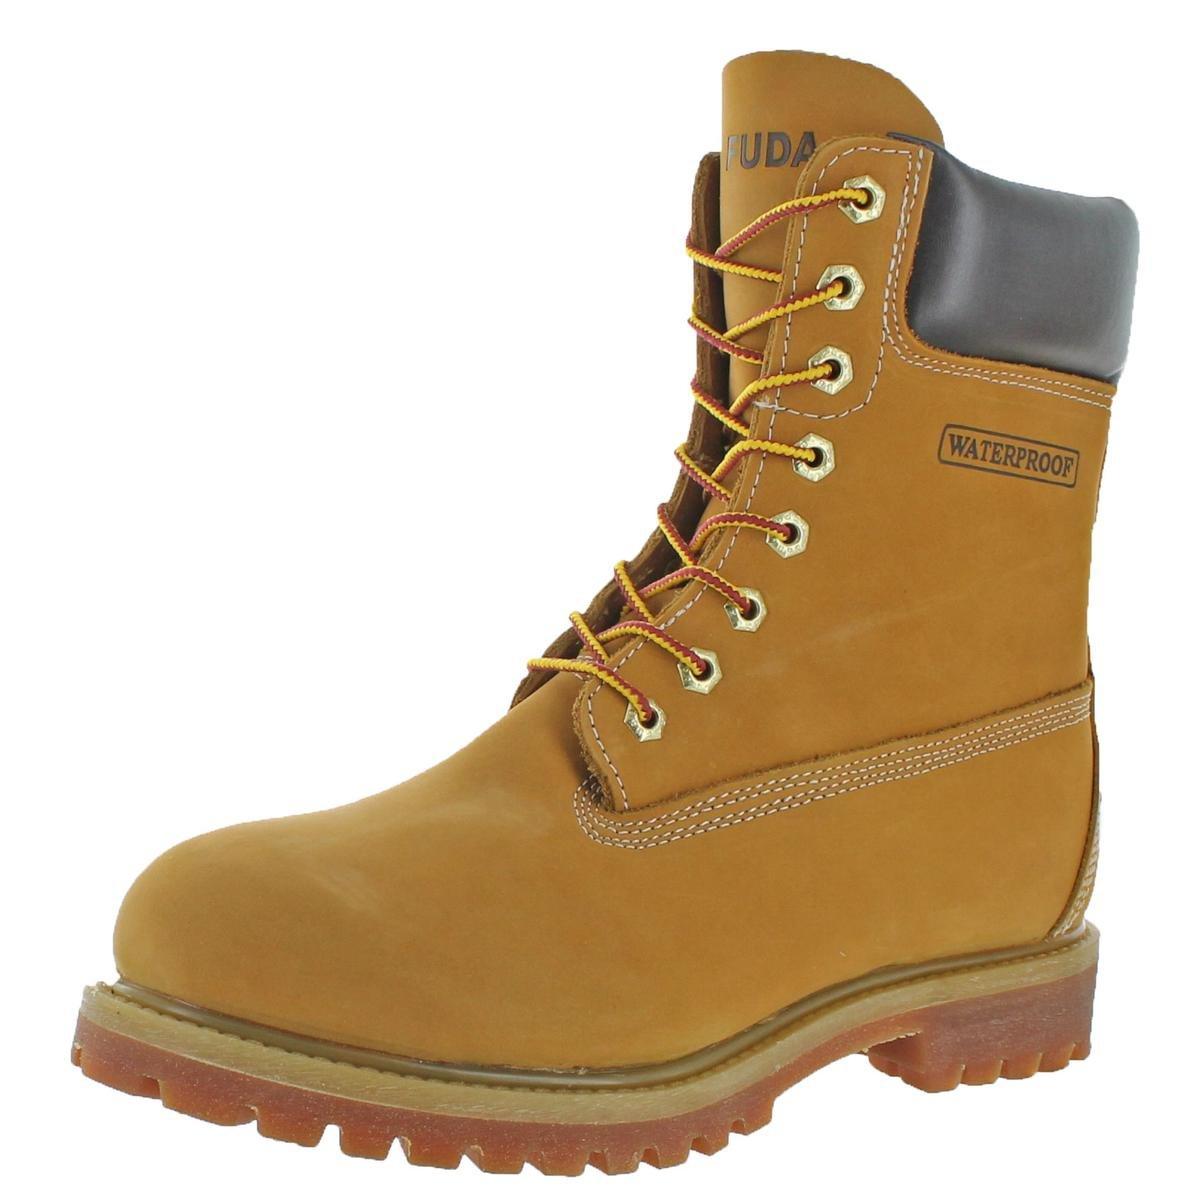 Men's 8'' Waterproof Nubuck Leather Gum Sole Work Boots Shoes Wheat Size 10